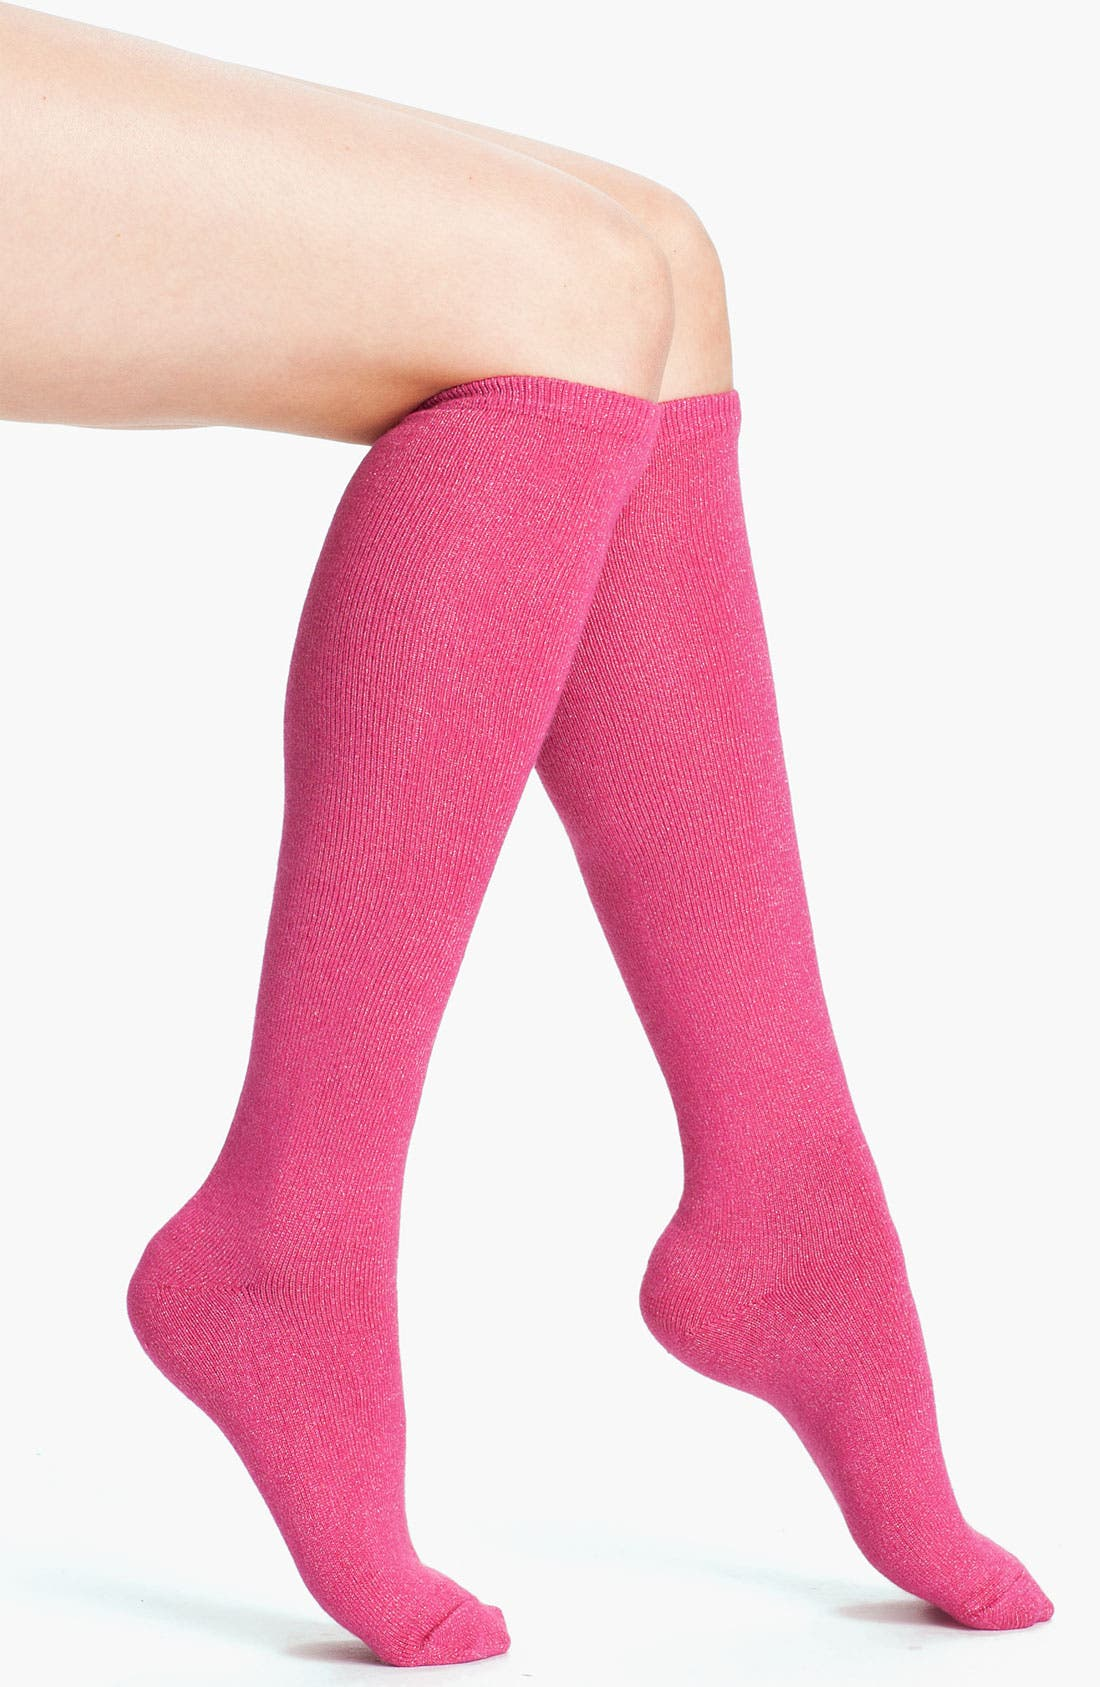 Alternate Image 1 Selected - kate spade new york 'holiday sparkle' knee high socks